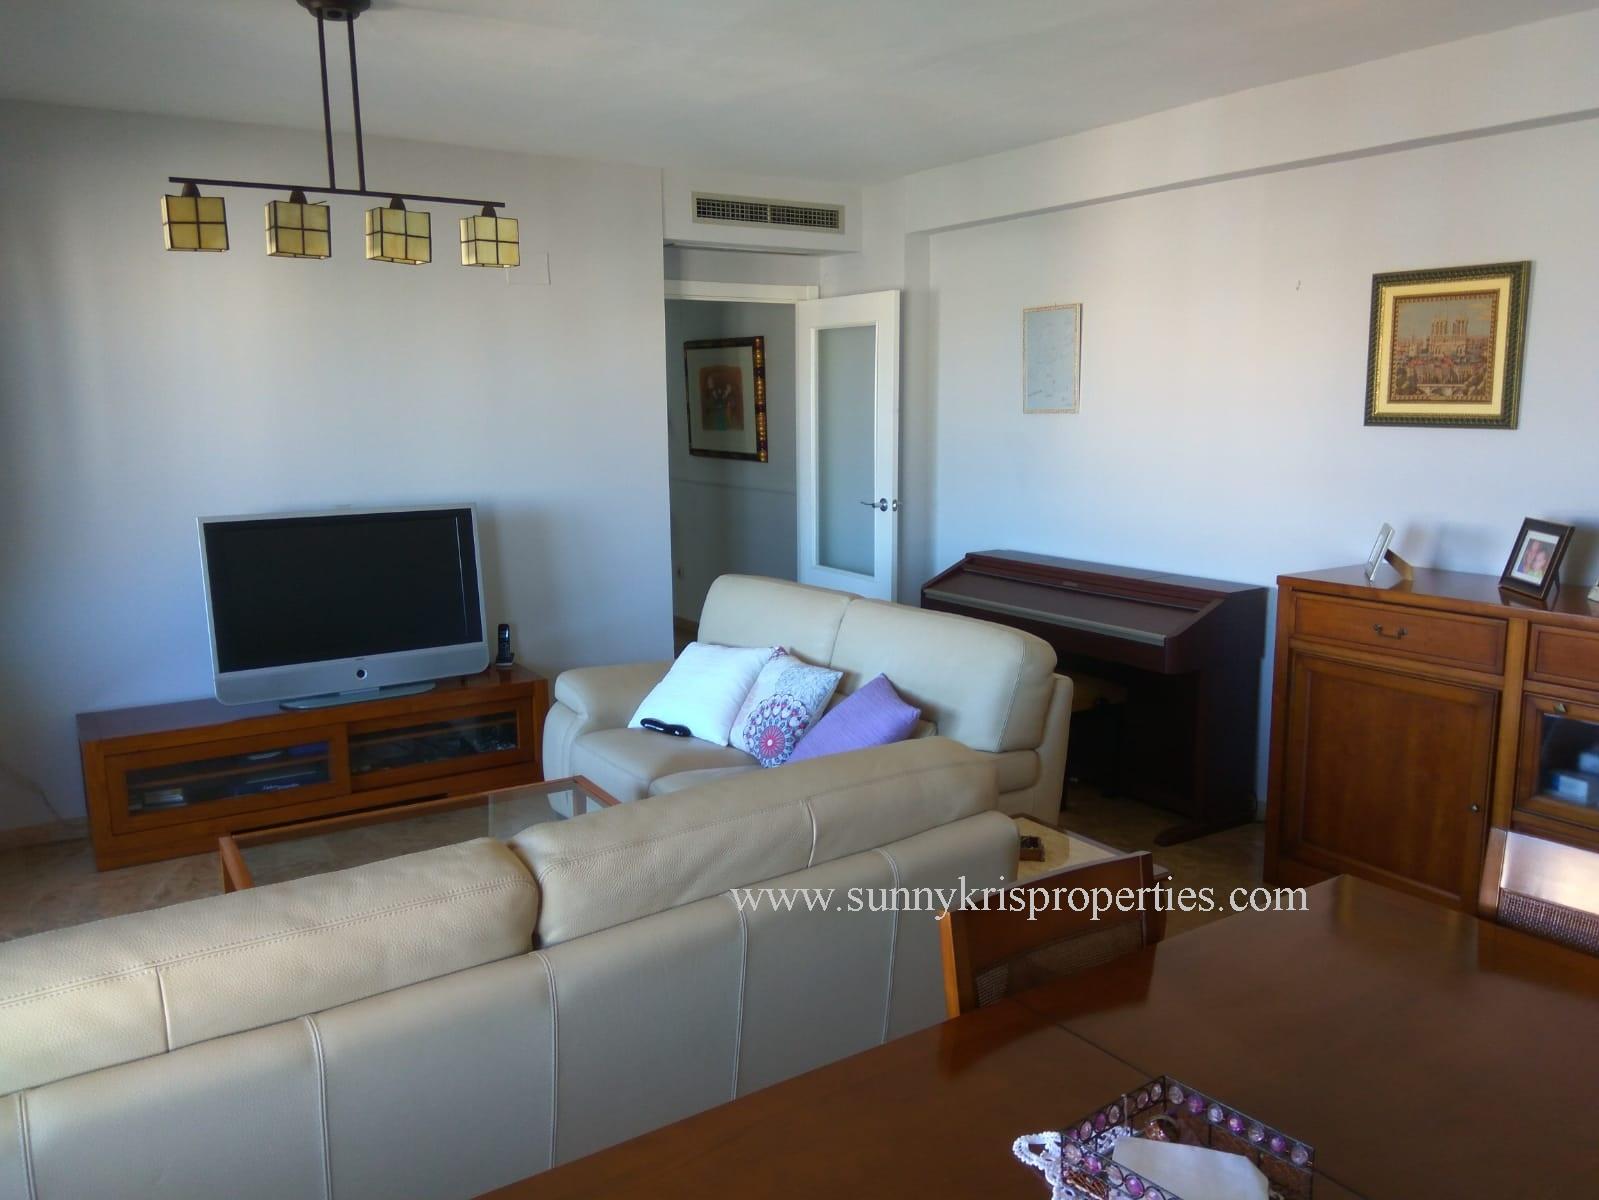 Excellent Duplex Apartment With a Roof Terrace in Miriam Blasco, San Juan Playa